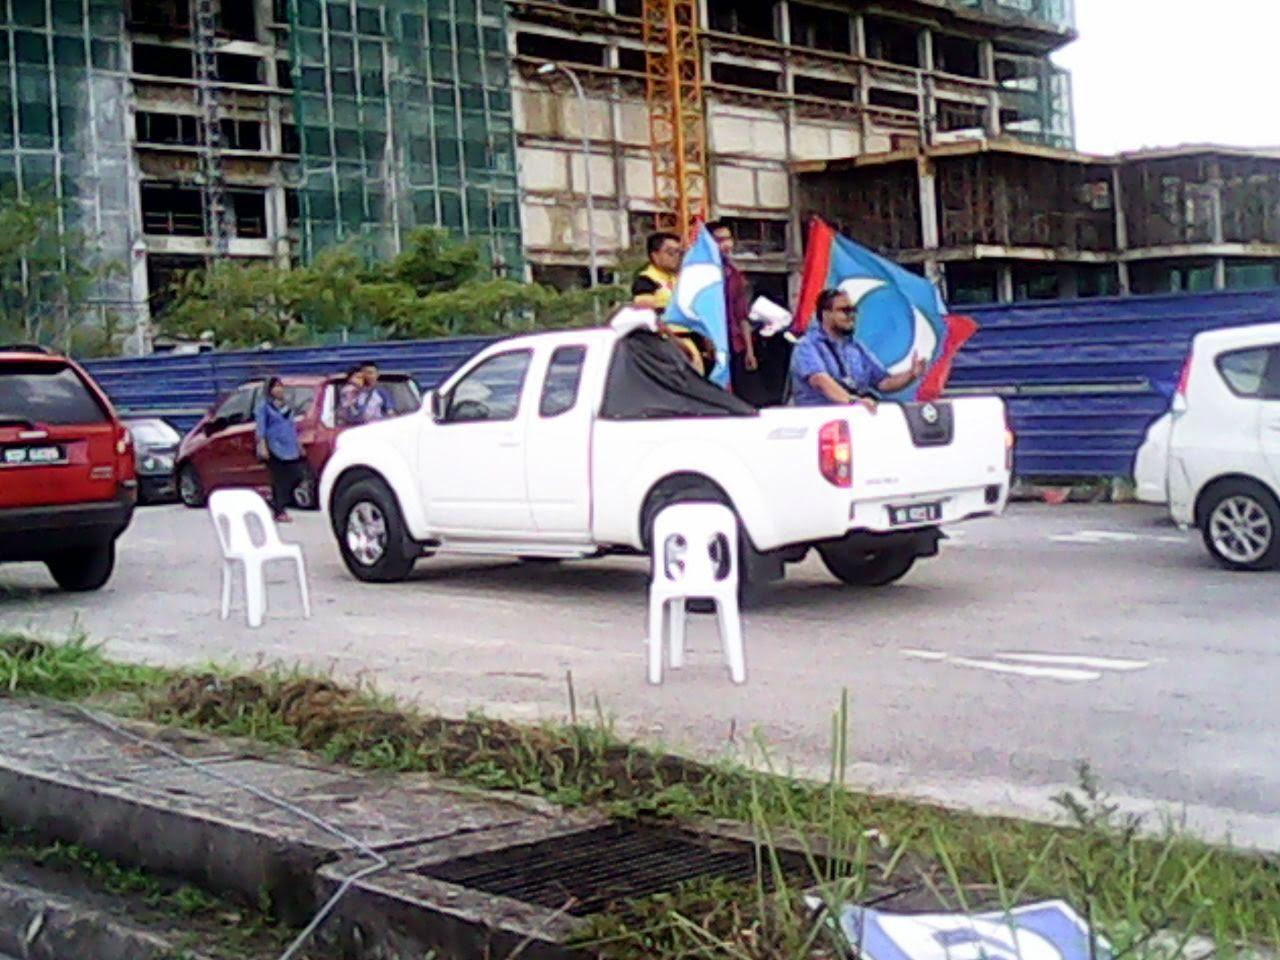 PANAS PROVOKASI PR Terus PINCANG Di PRKPermatangPauh kakwan4pp